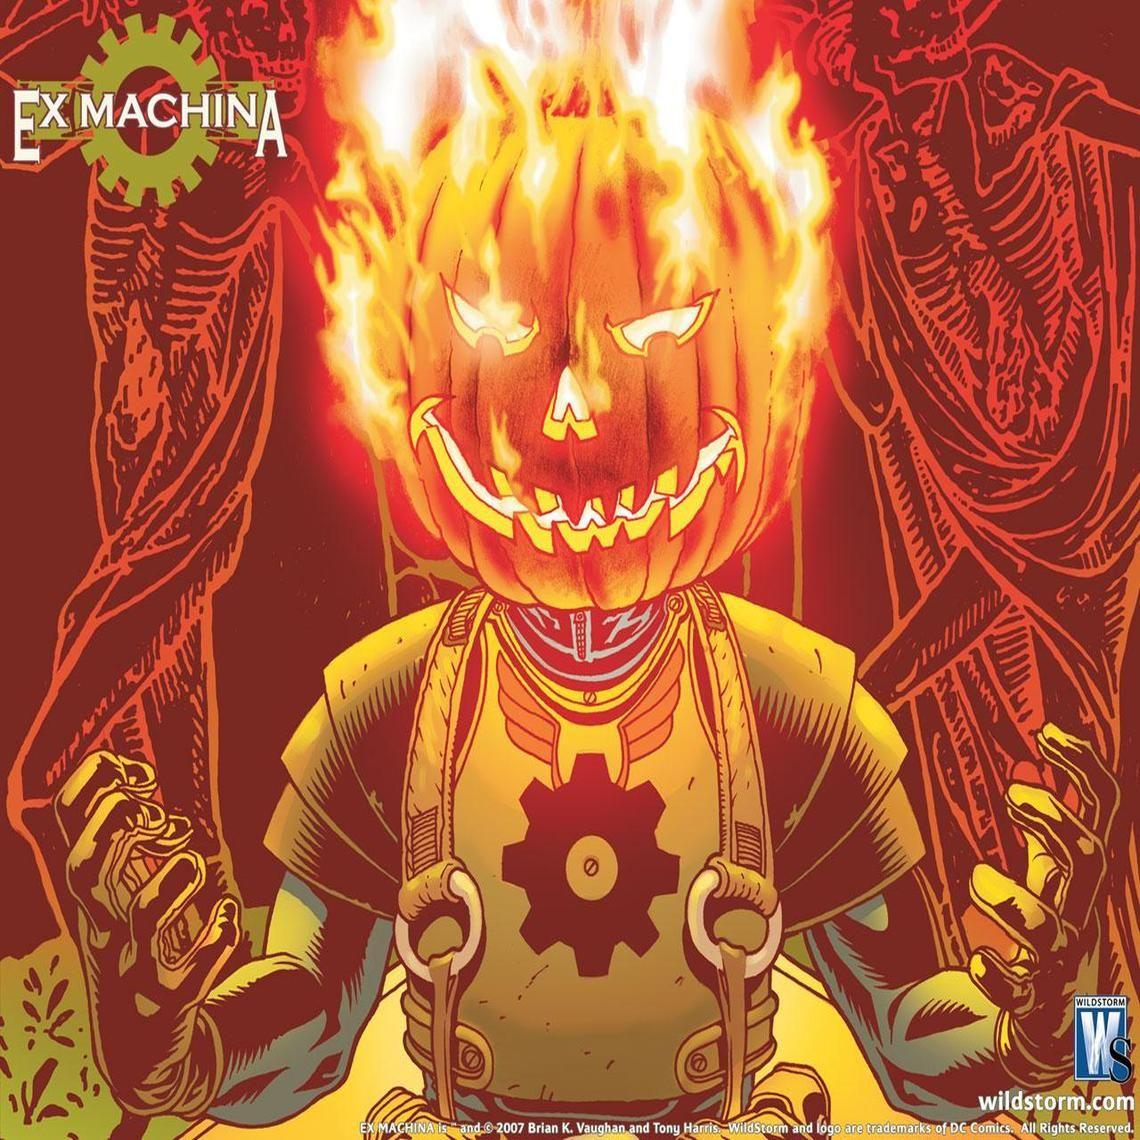 Ex Machina Halloween Special